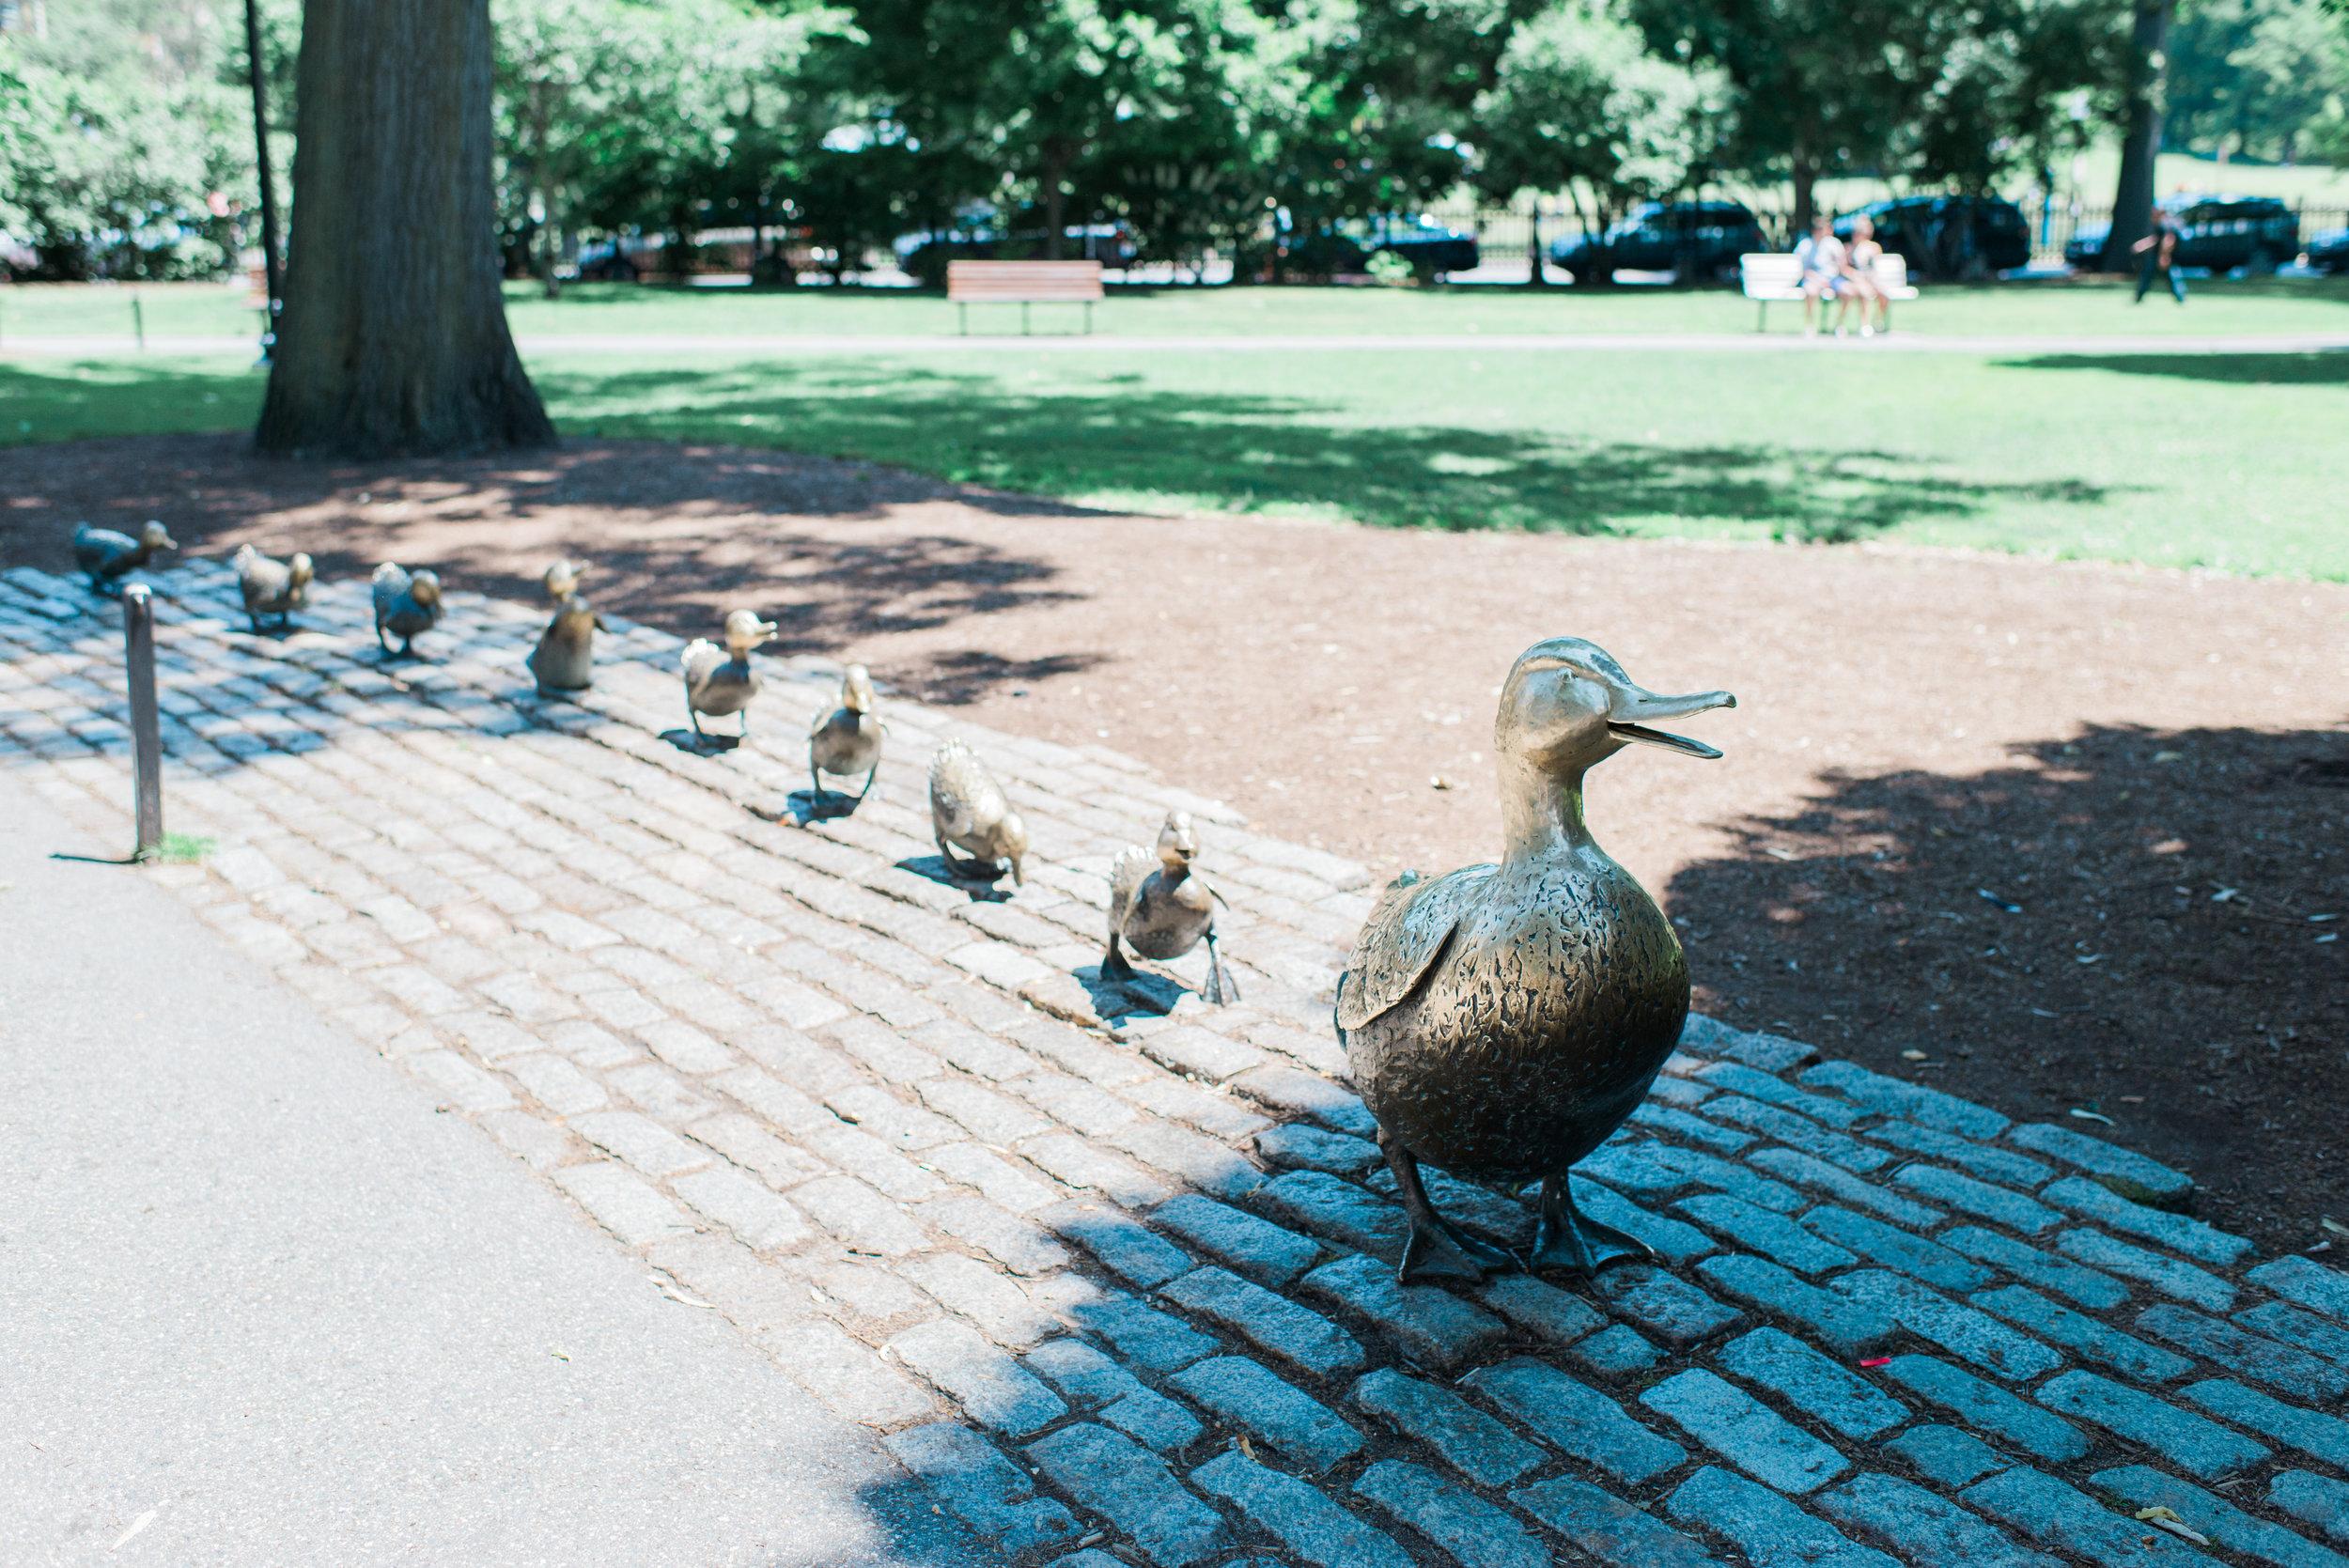 Make Way for Ducklings statue in the Boston Public Garden